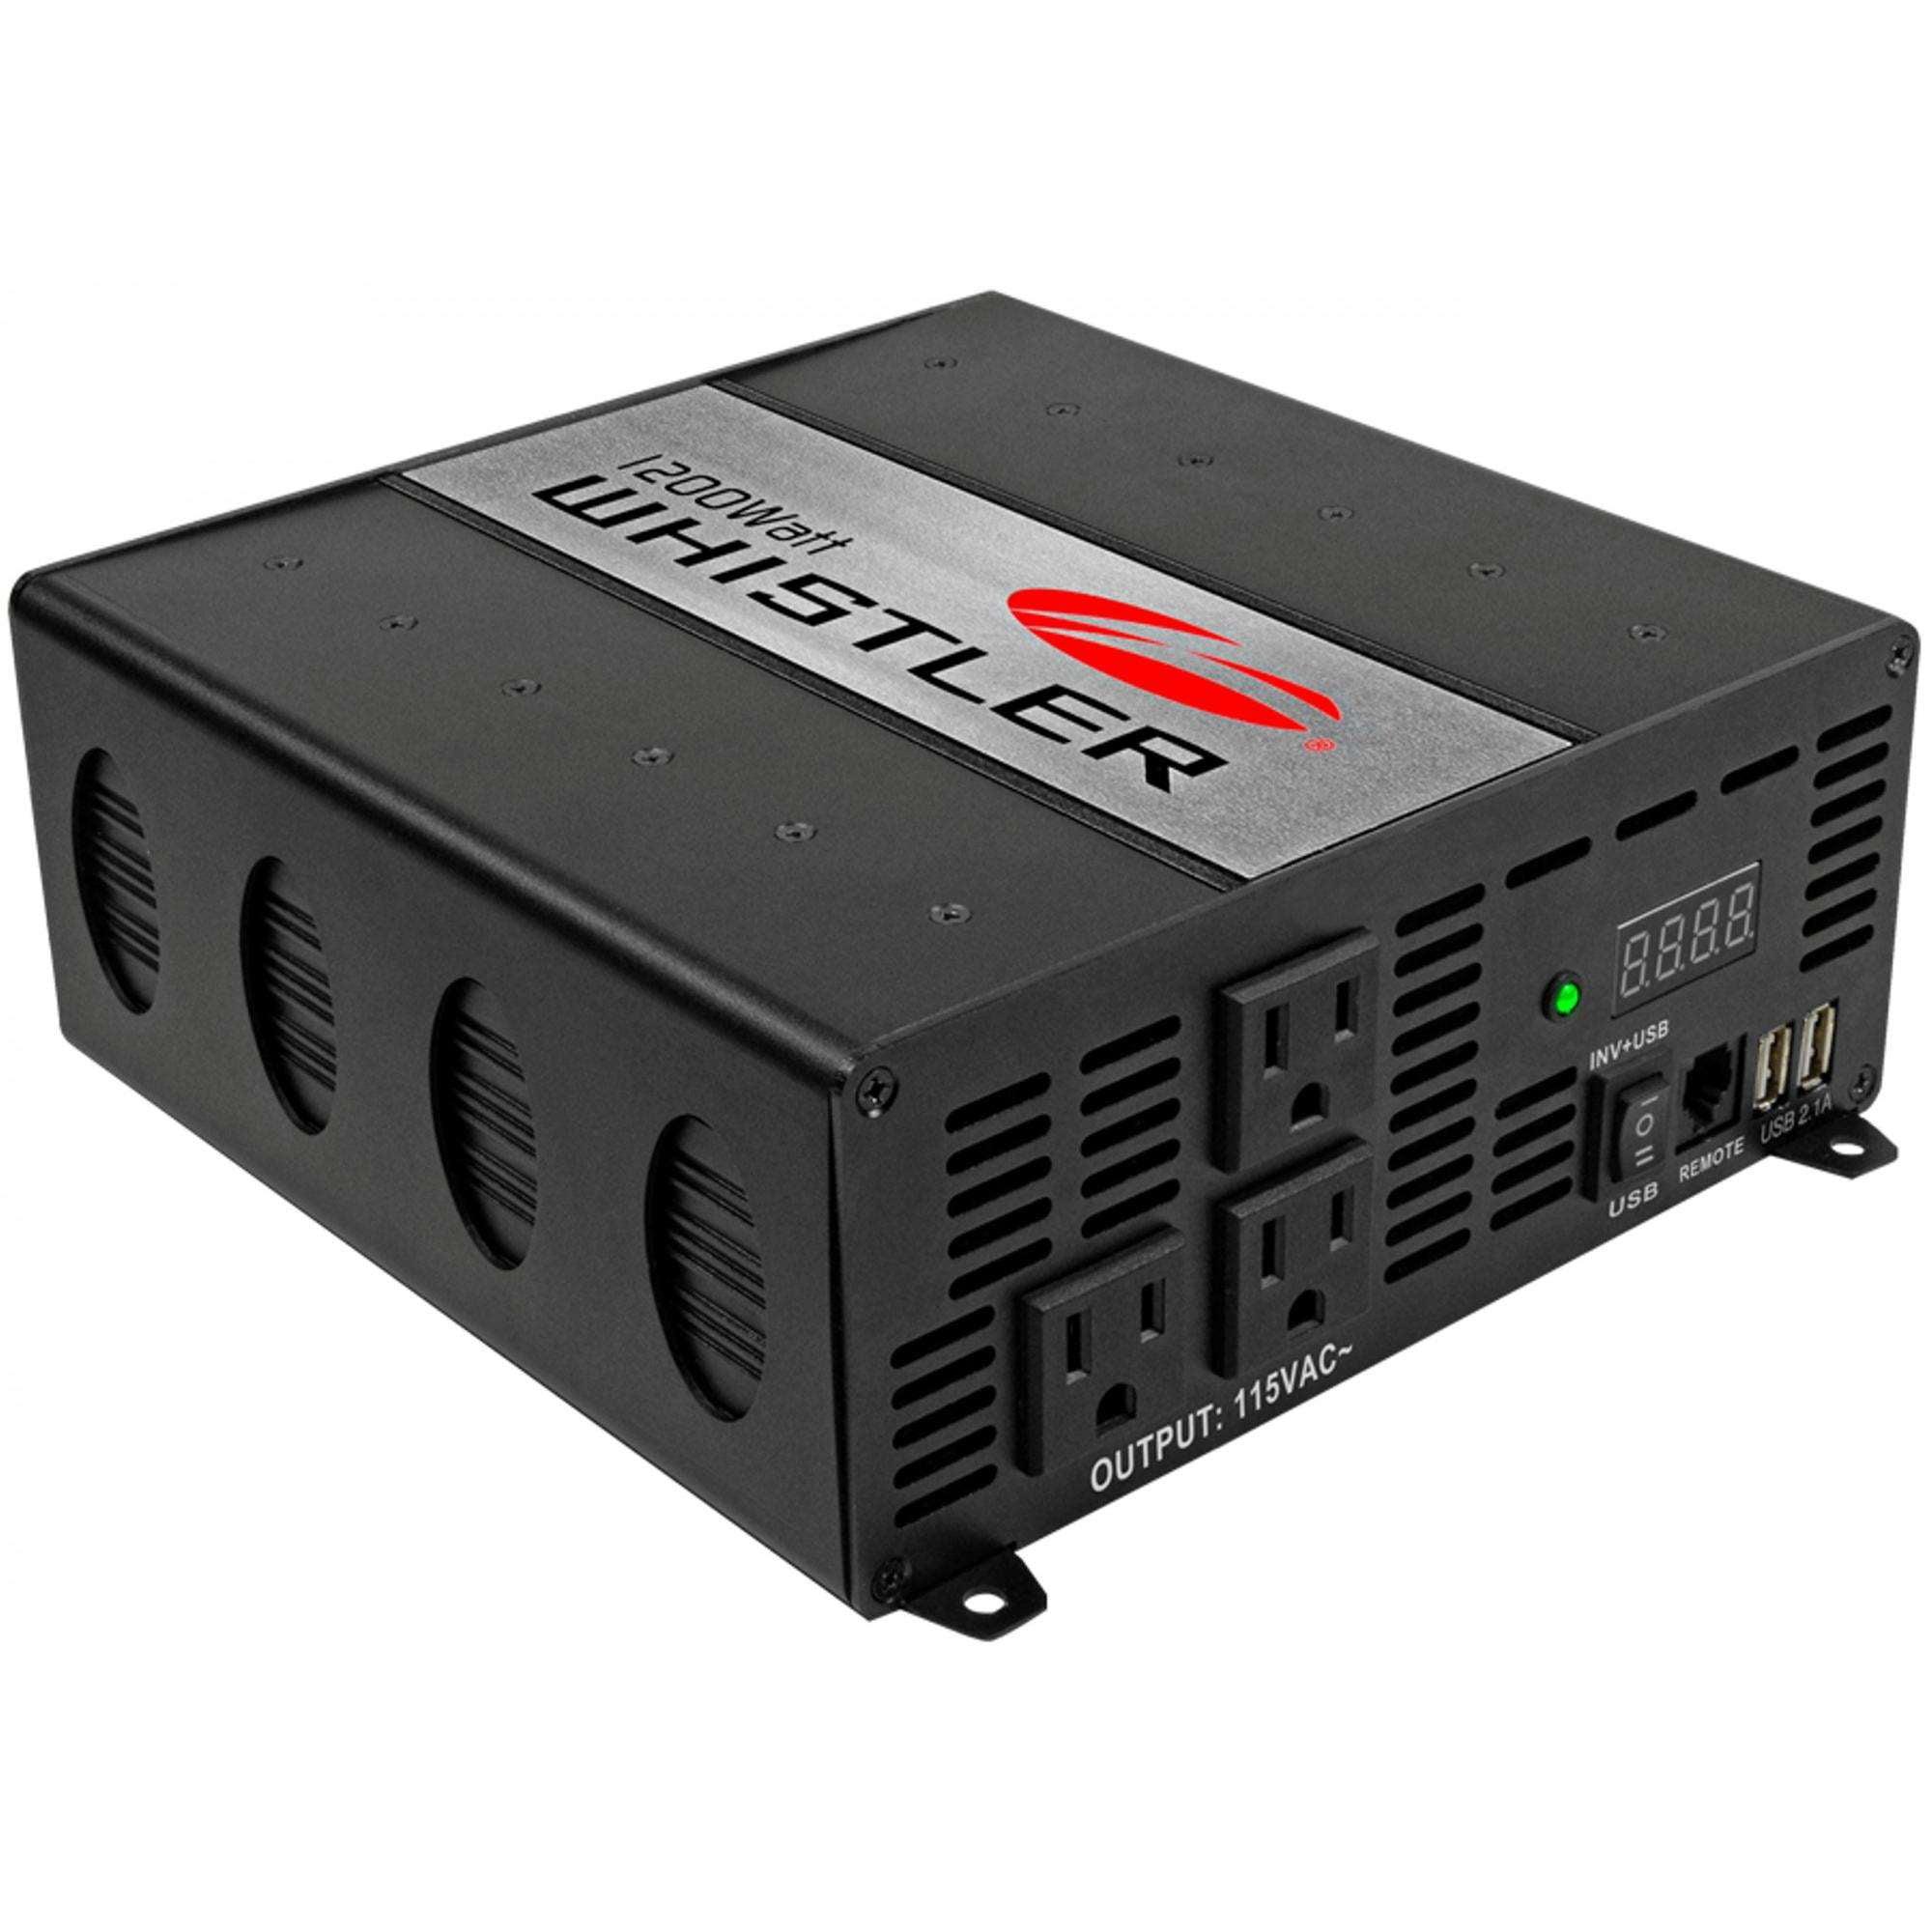 Whistler 2000W 12V DC to 115V AC Power Inverter w/ Circuit Protection